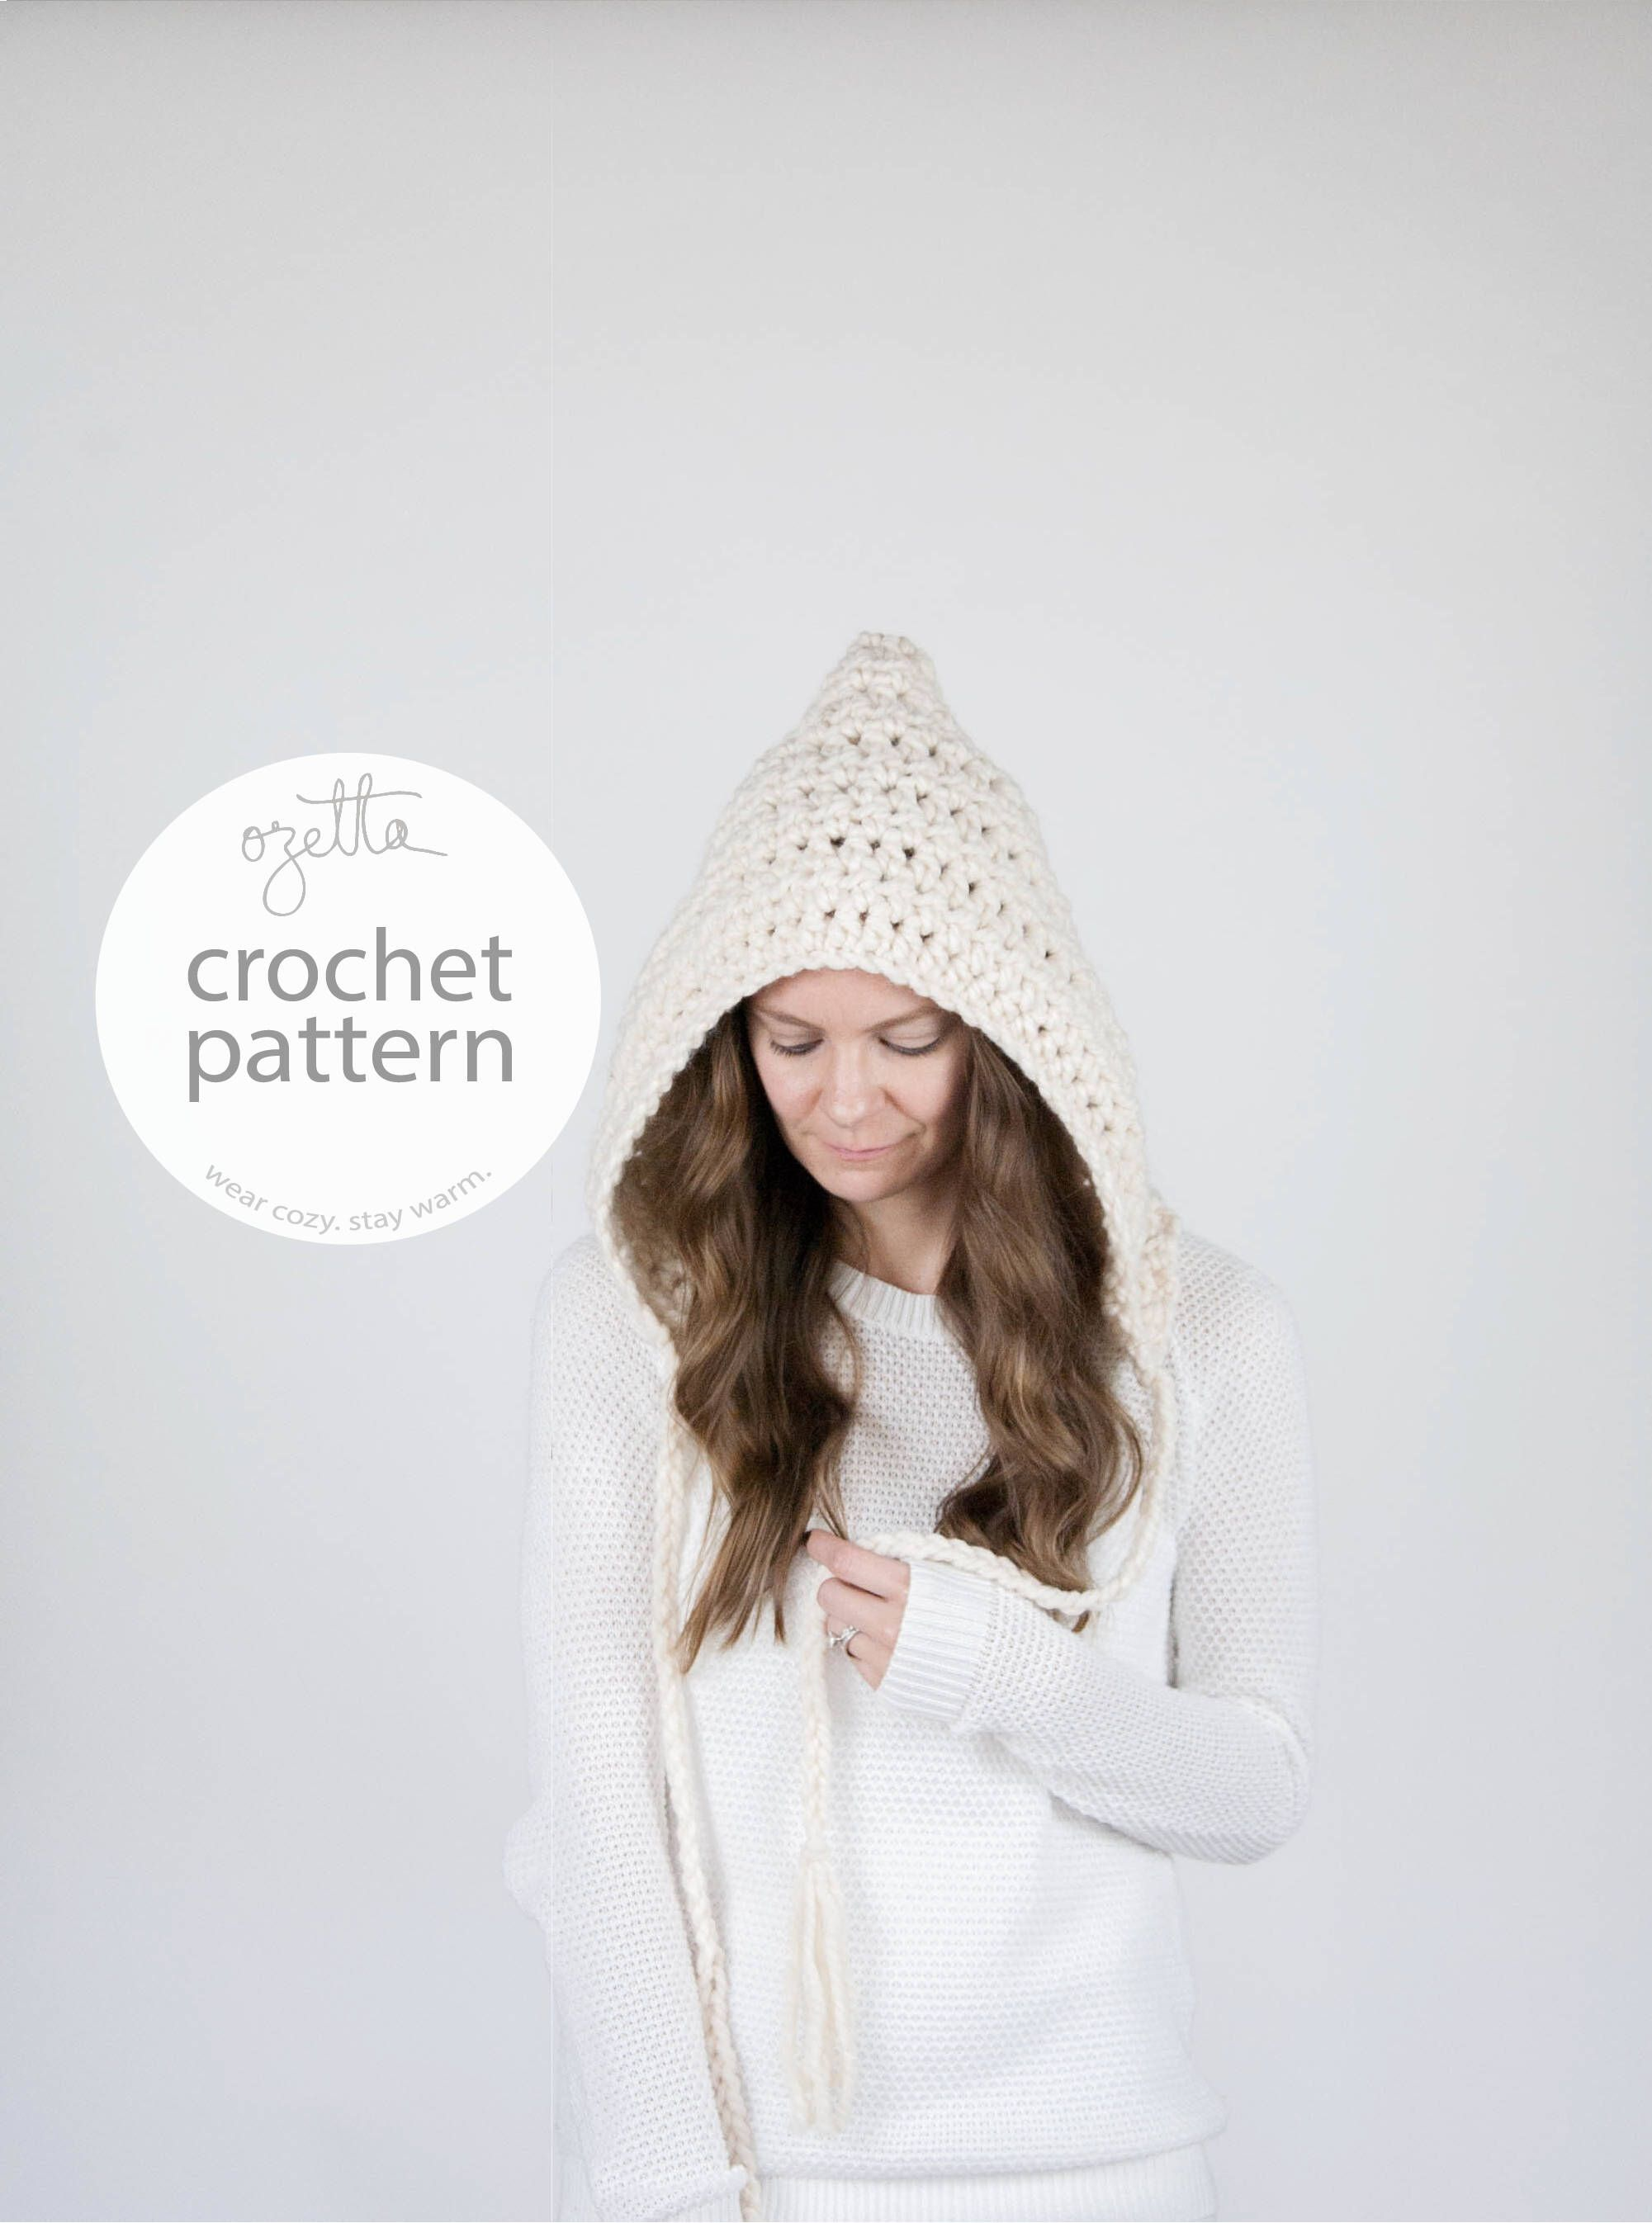 Pin de Tatas Tavares en Everything Crochet (and knit) | Pinterest ...